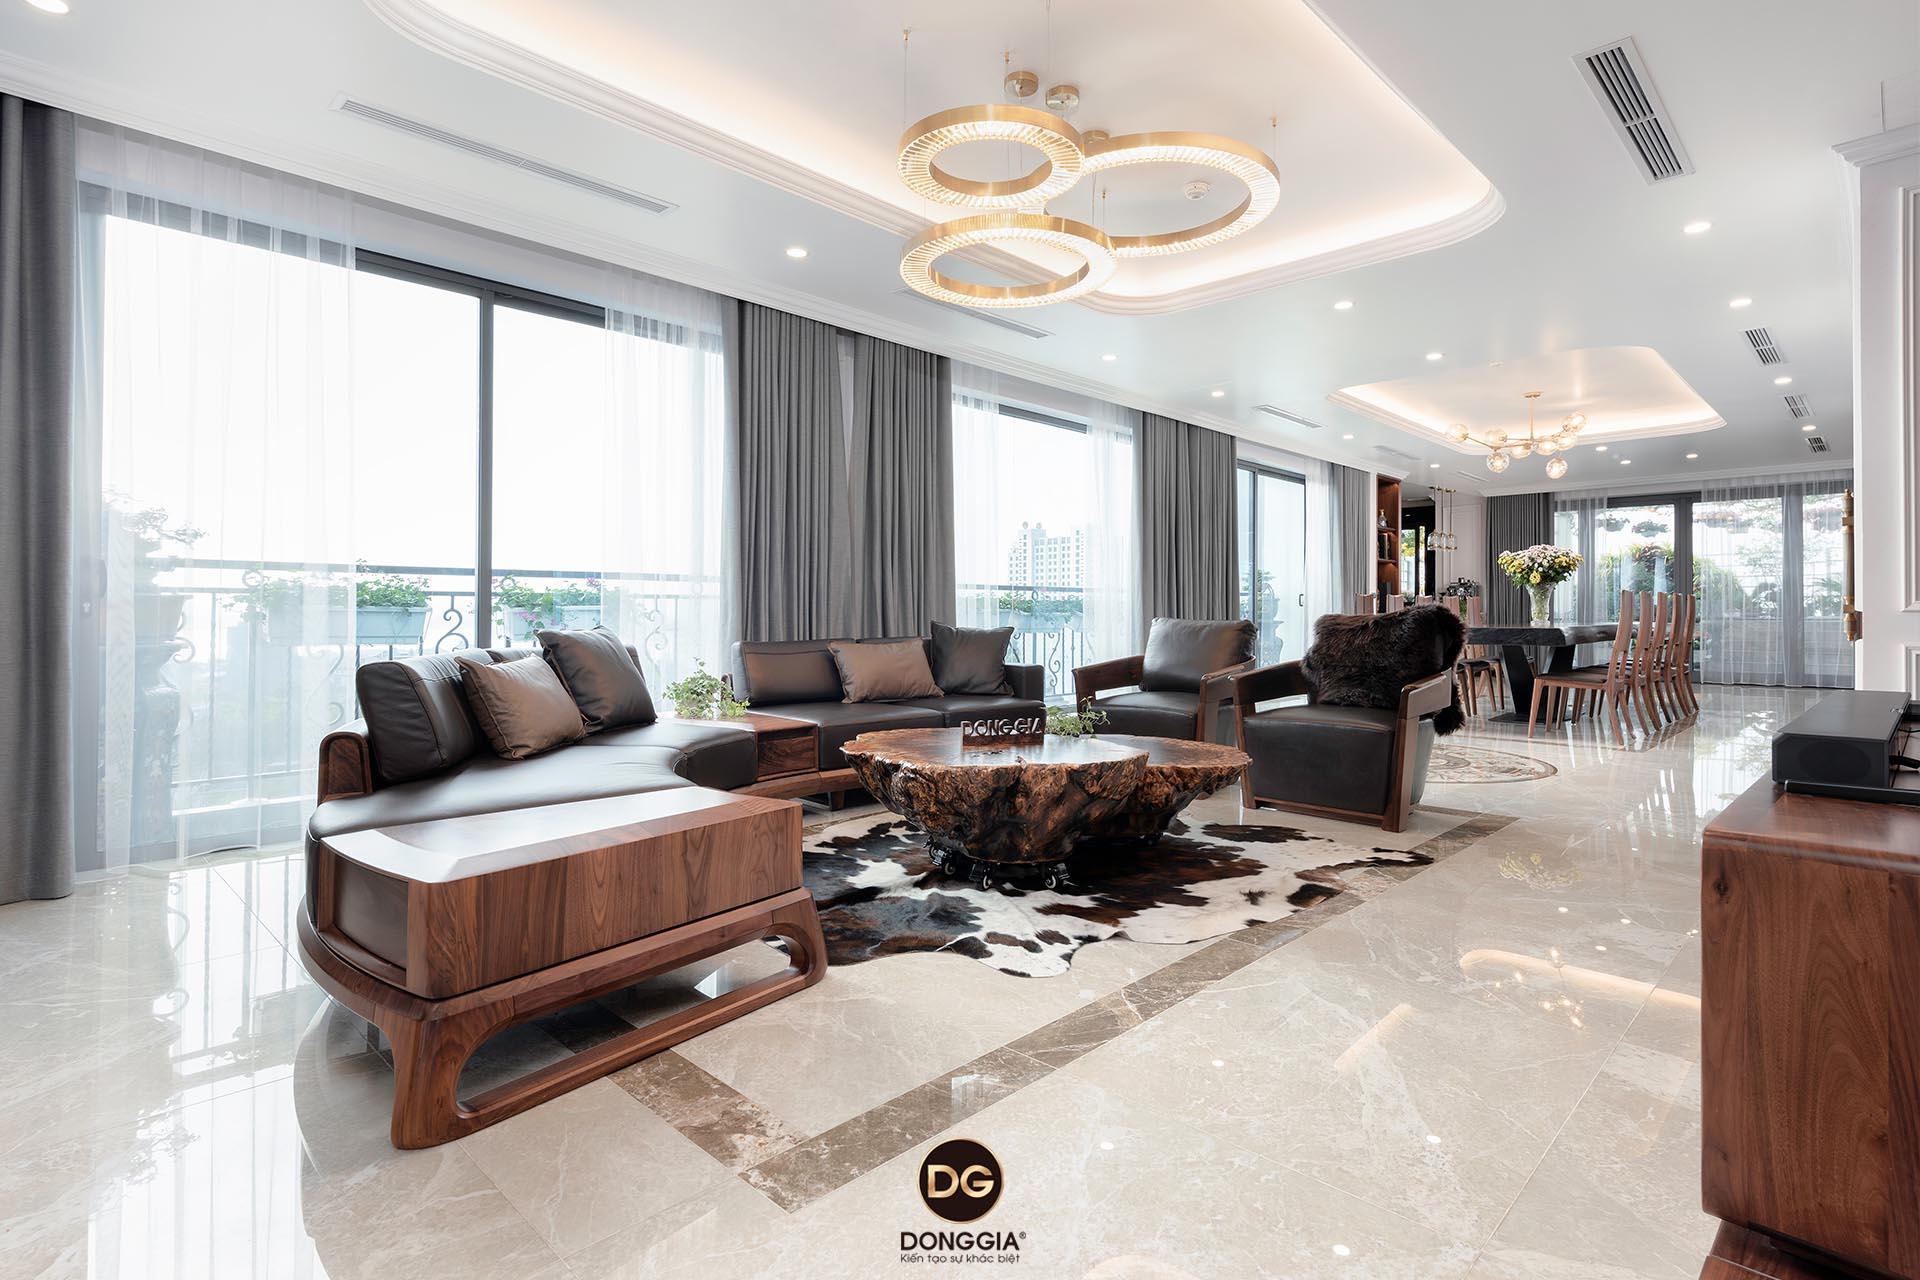 thi-cong-noi-that-go-oc-cho-penthouse-2020